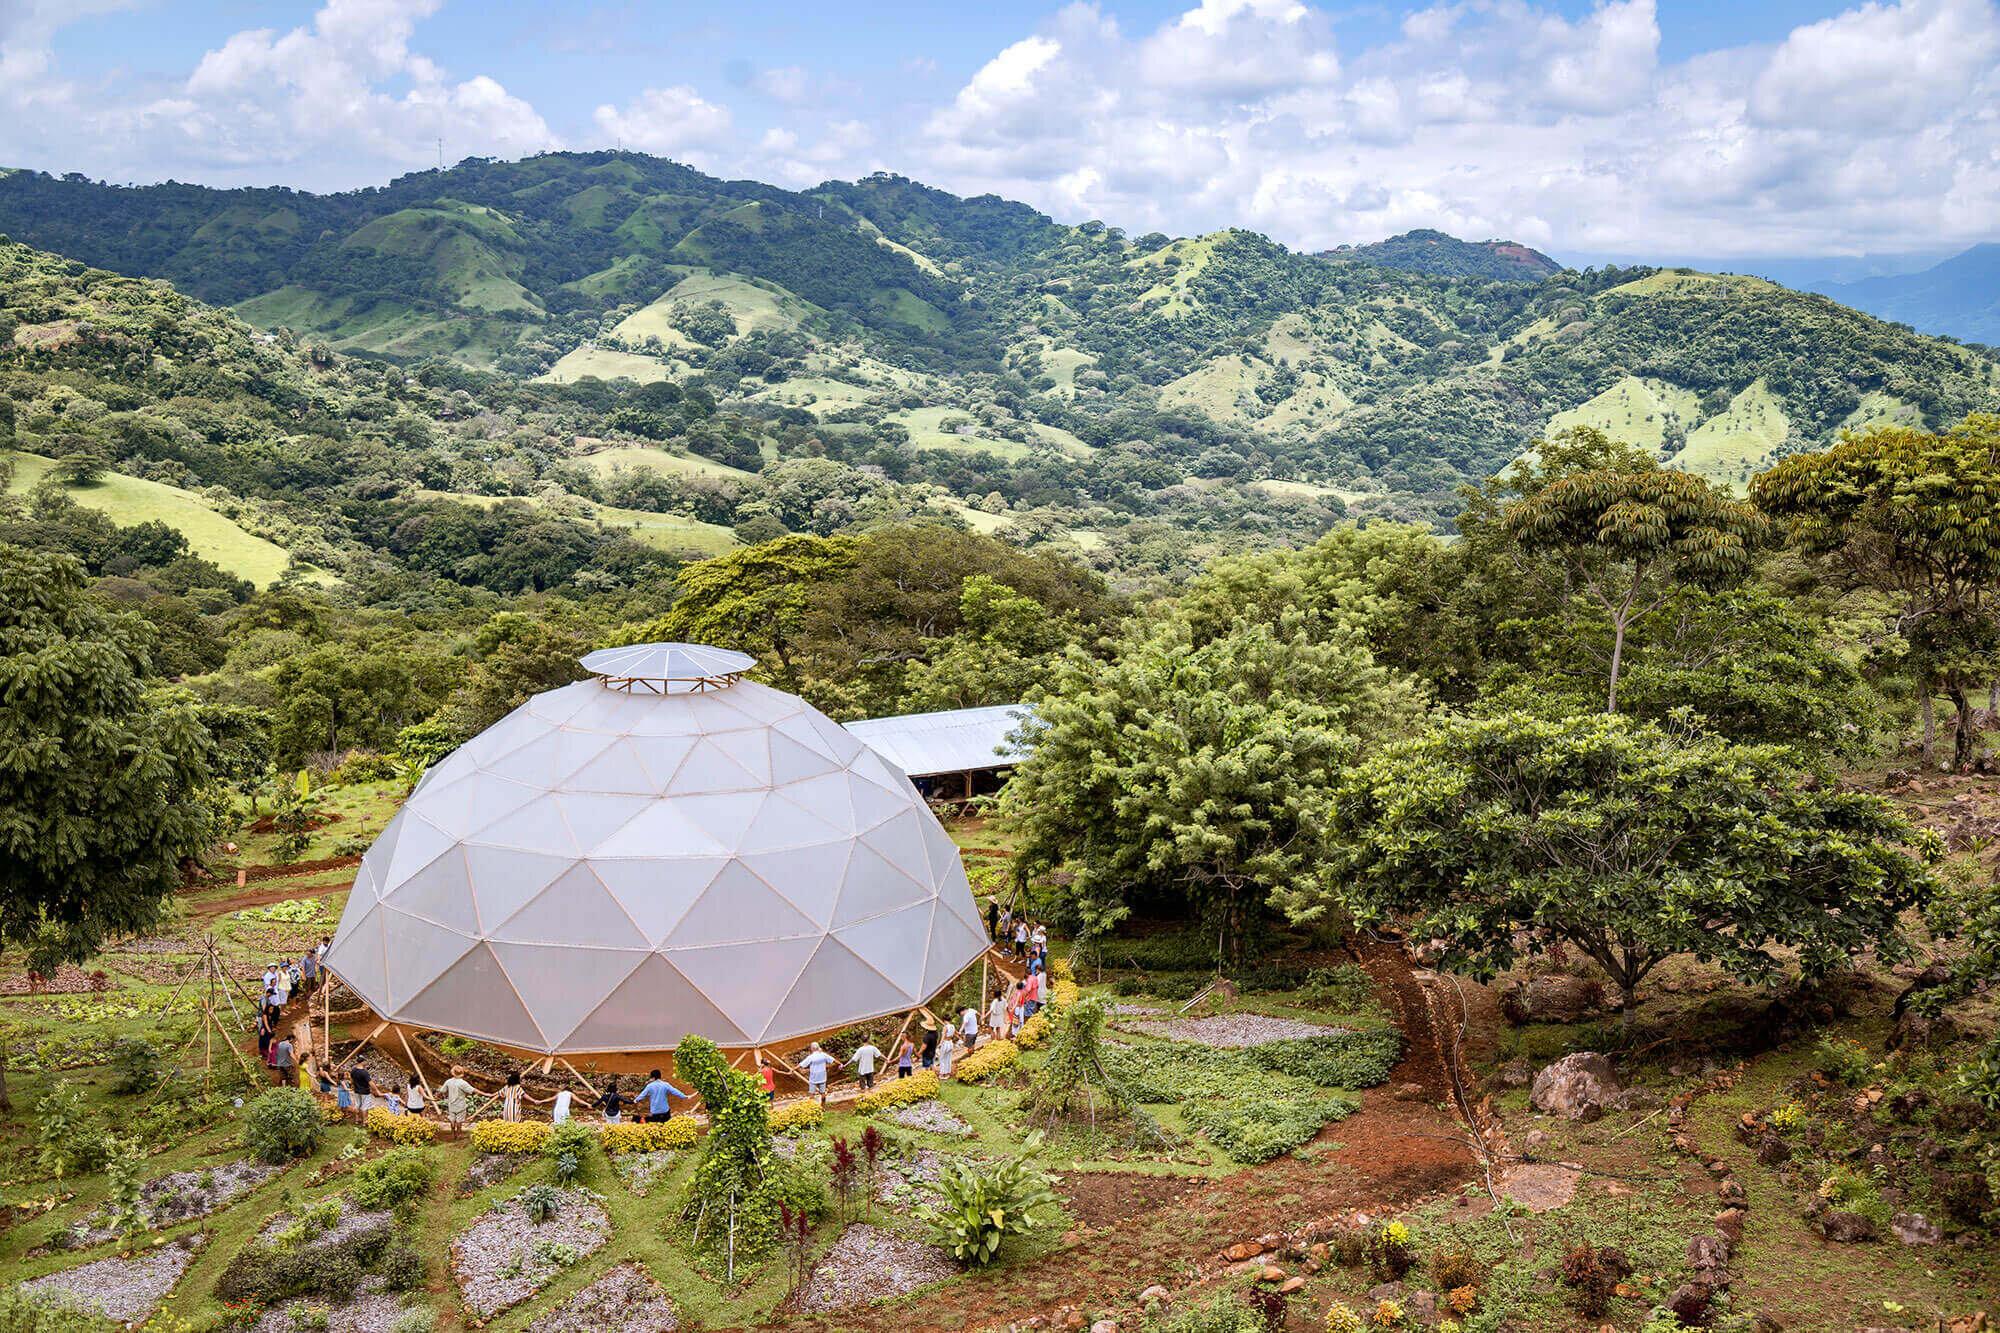 alegria-view-community-dome-circle (1).jpeg